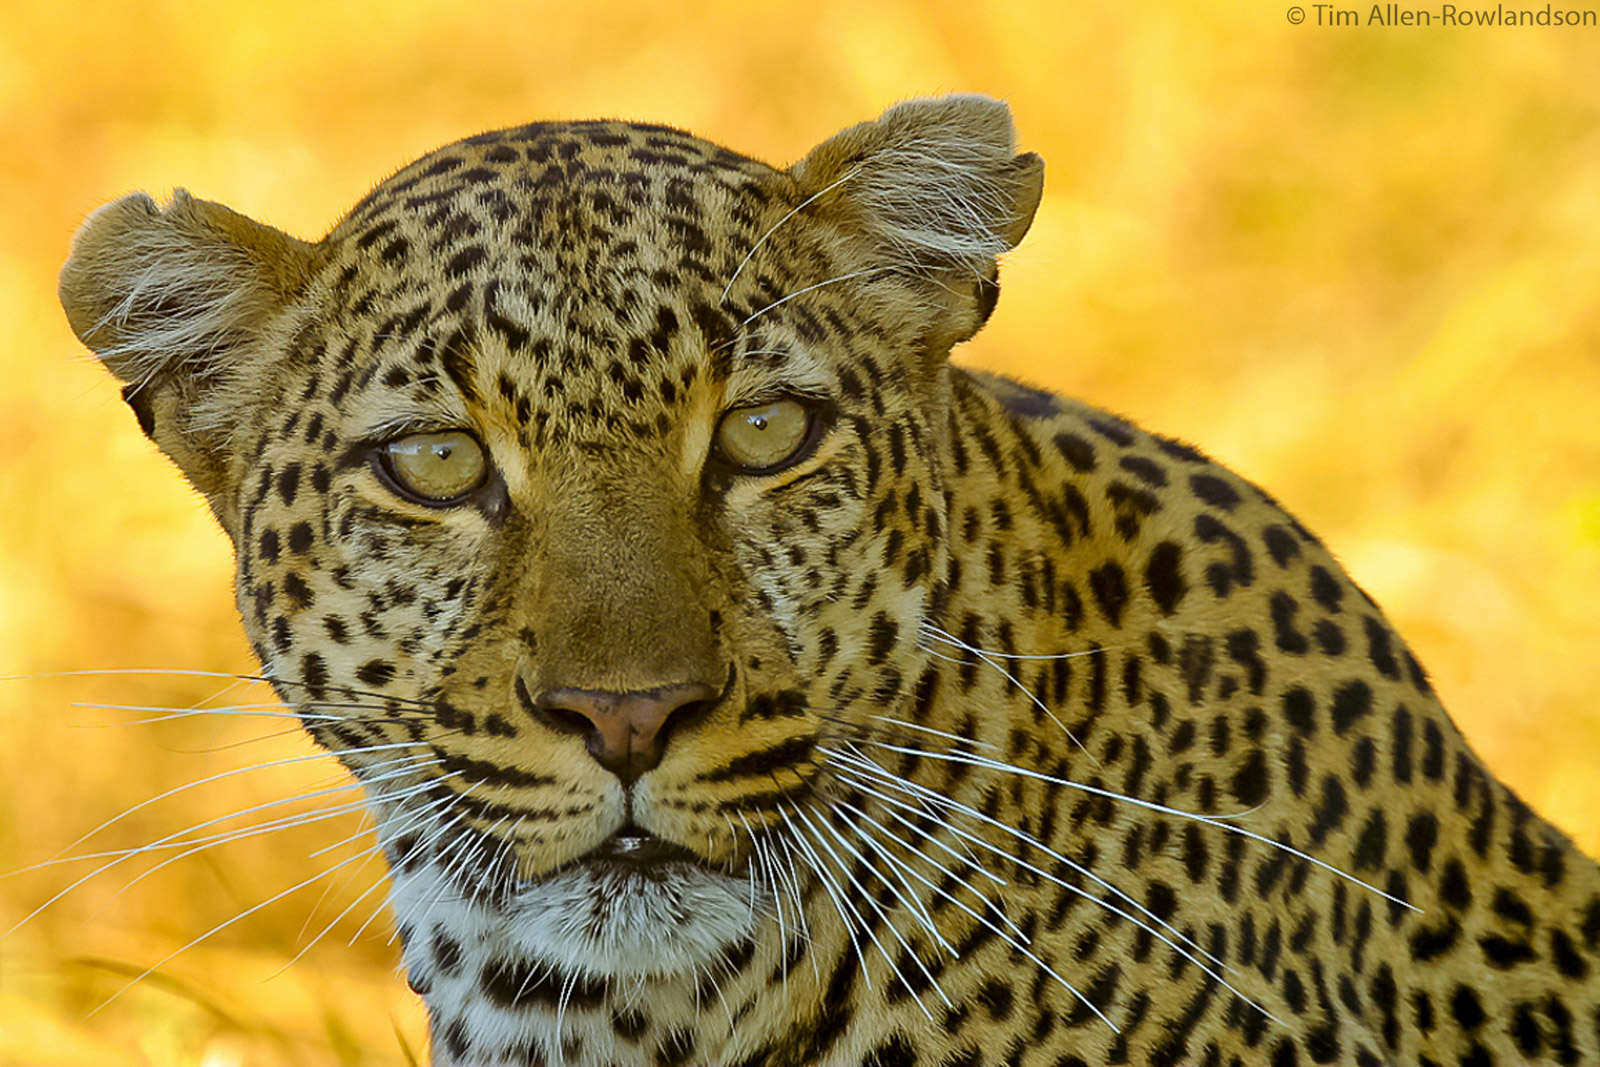 Female leopard, late afternoon, Masai Mara